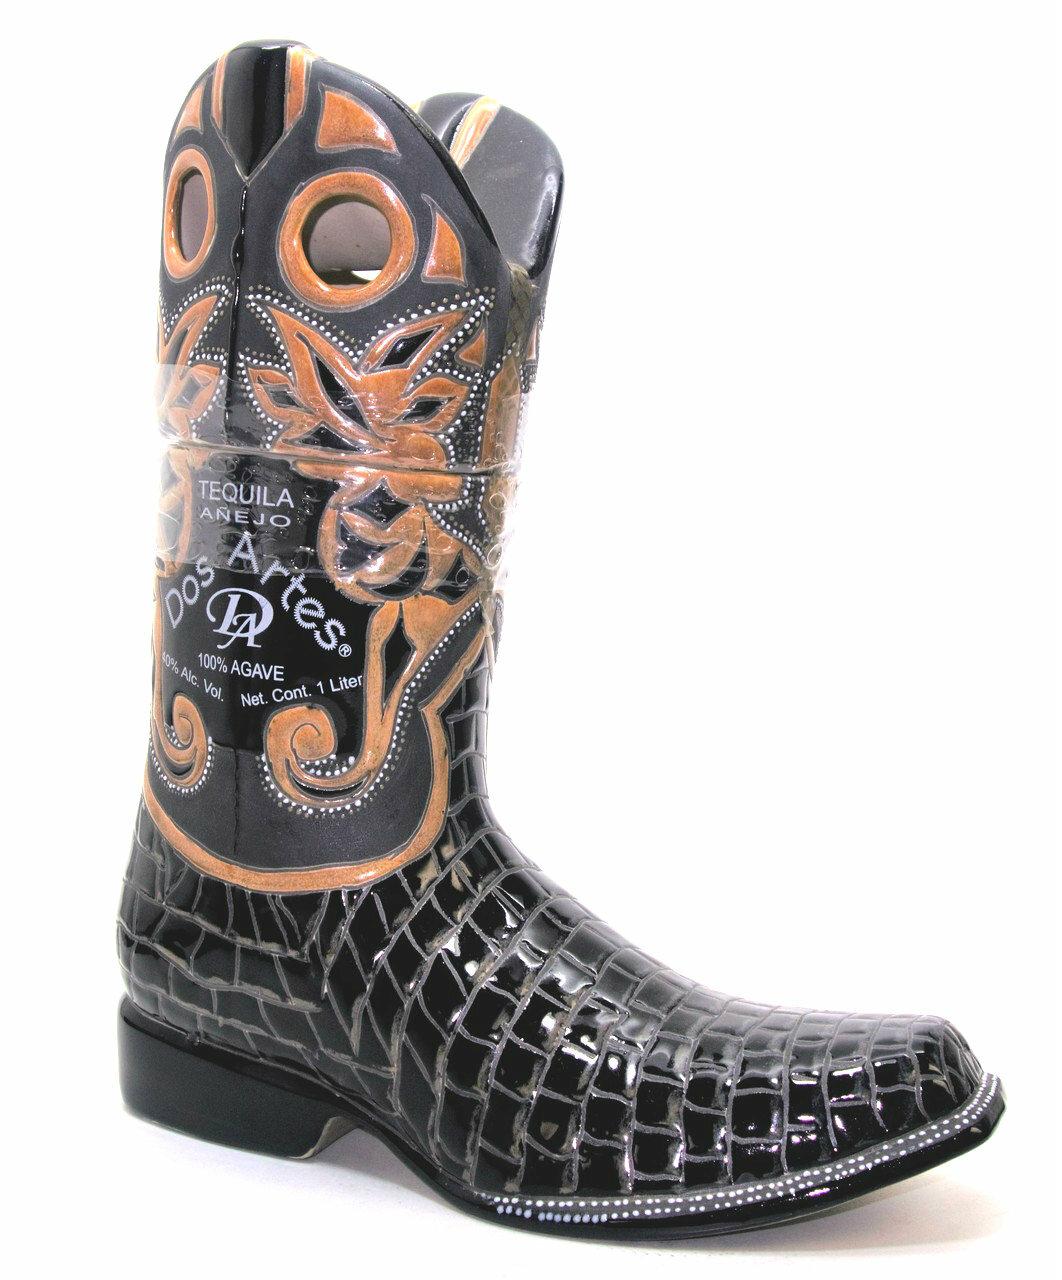 Dos Artes Anejo Ceramic Boots 1 l